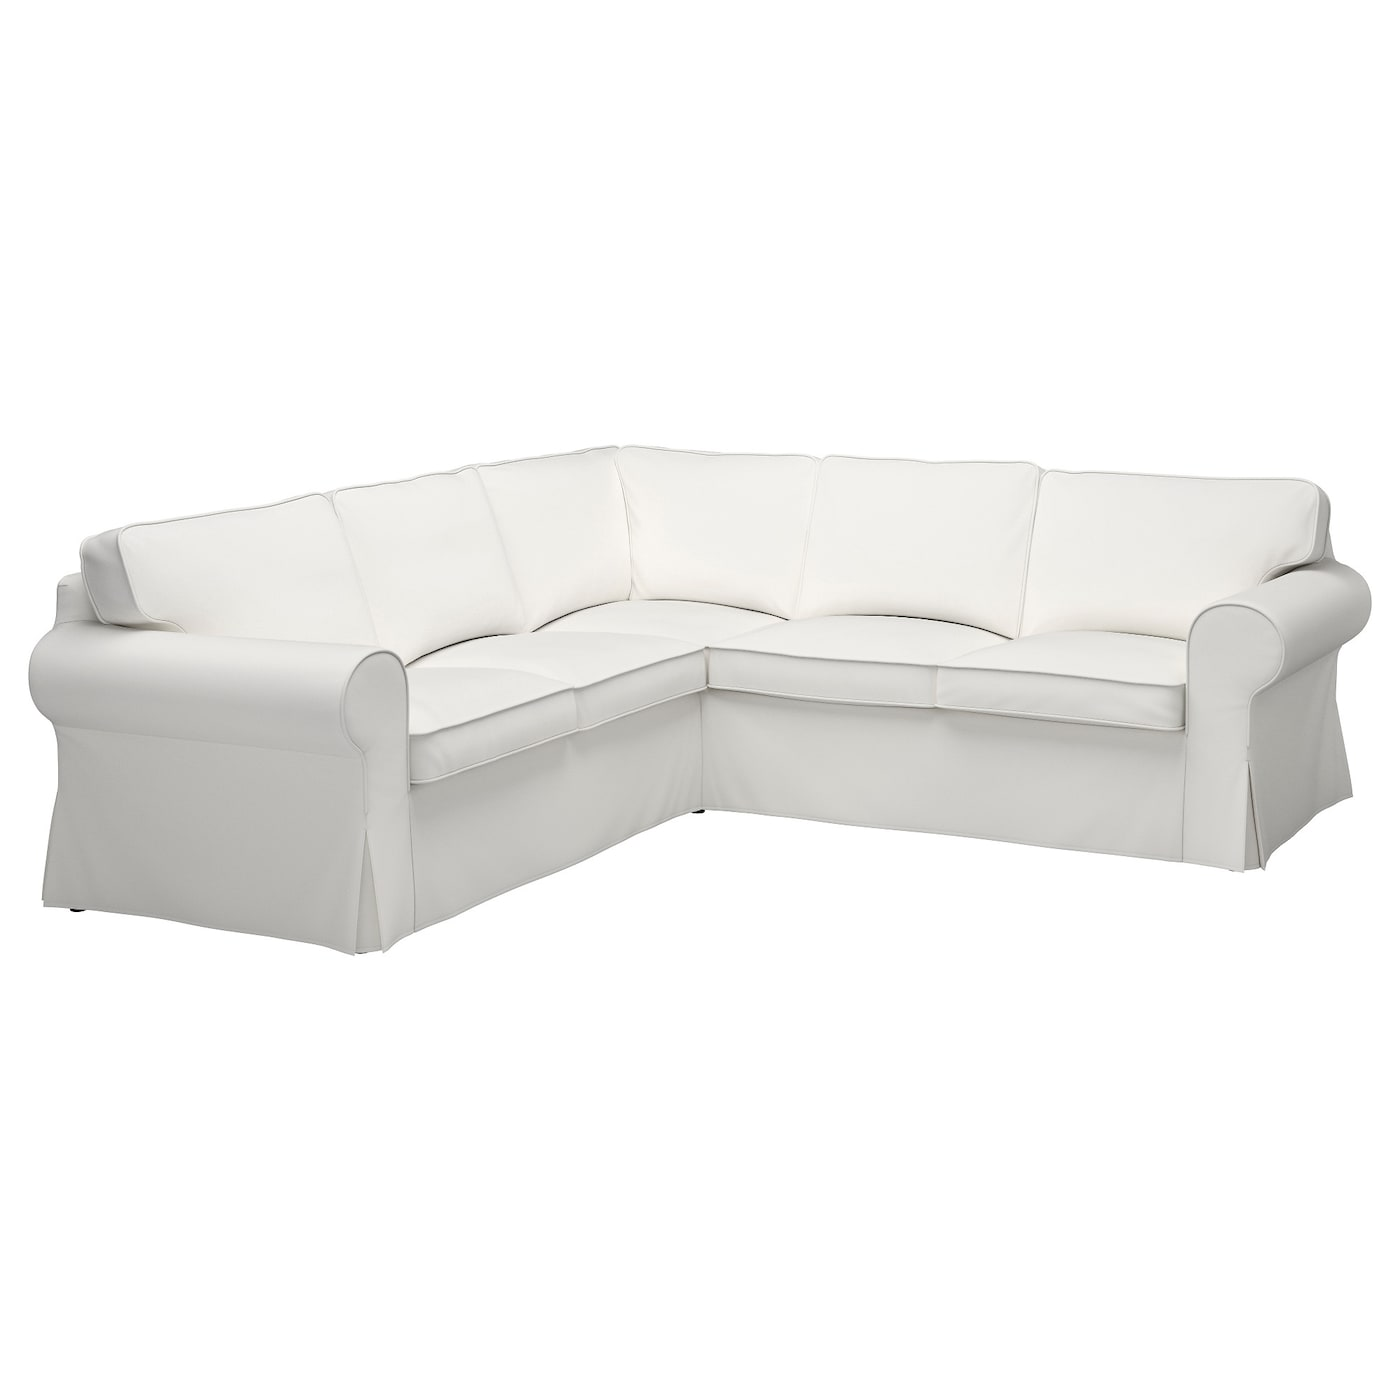 ektorp housse canap d 39 angle 4 places vittaryd blanc ikea. Black Bedroom Furniture Sets. Home Design Ideas